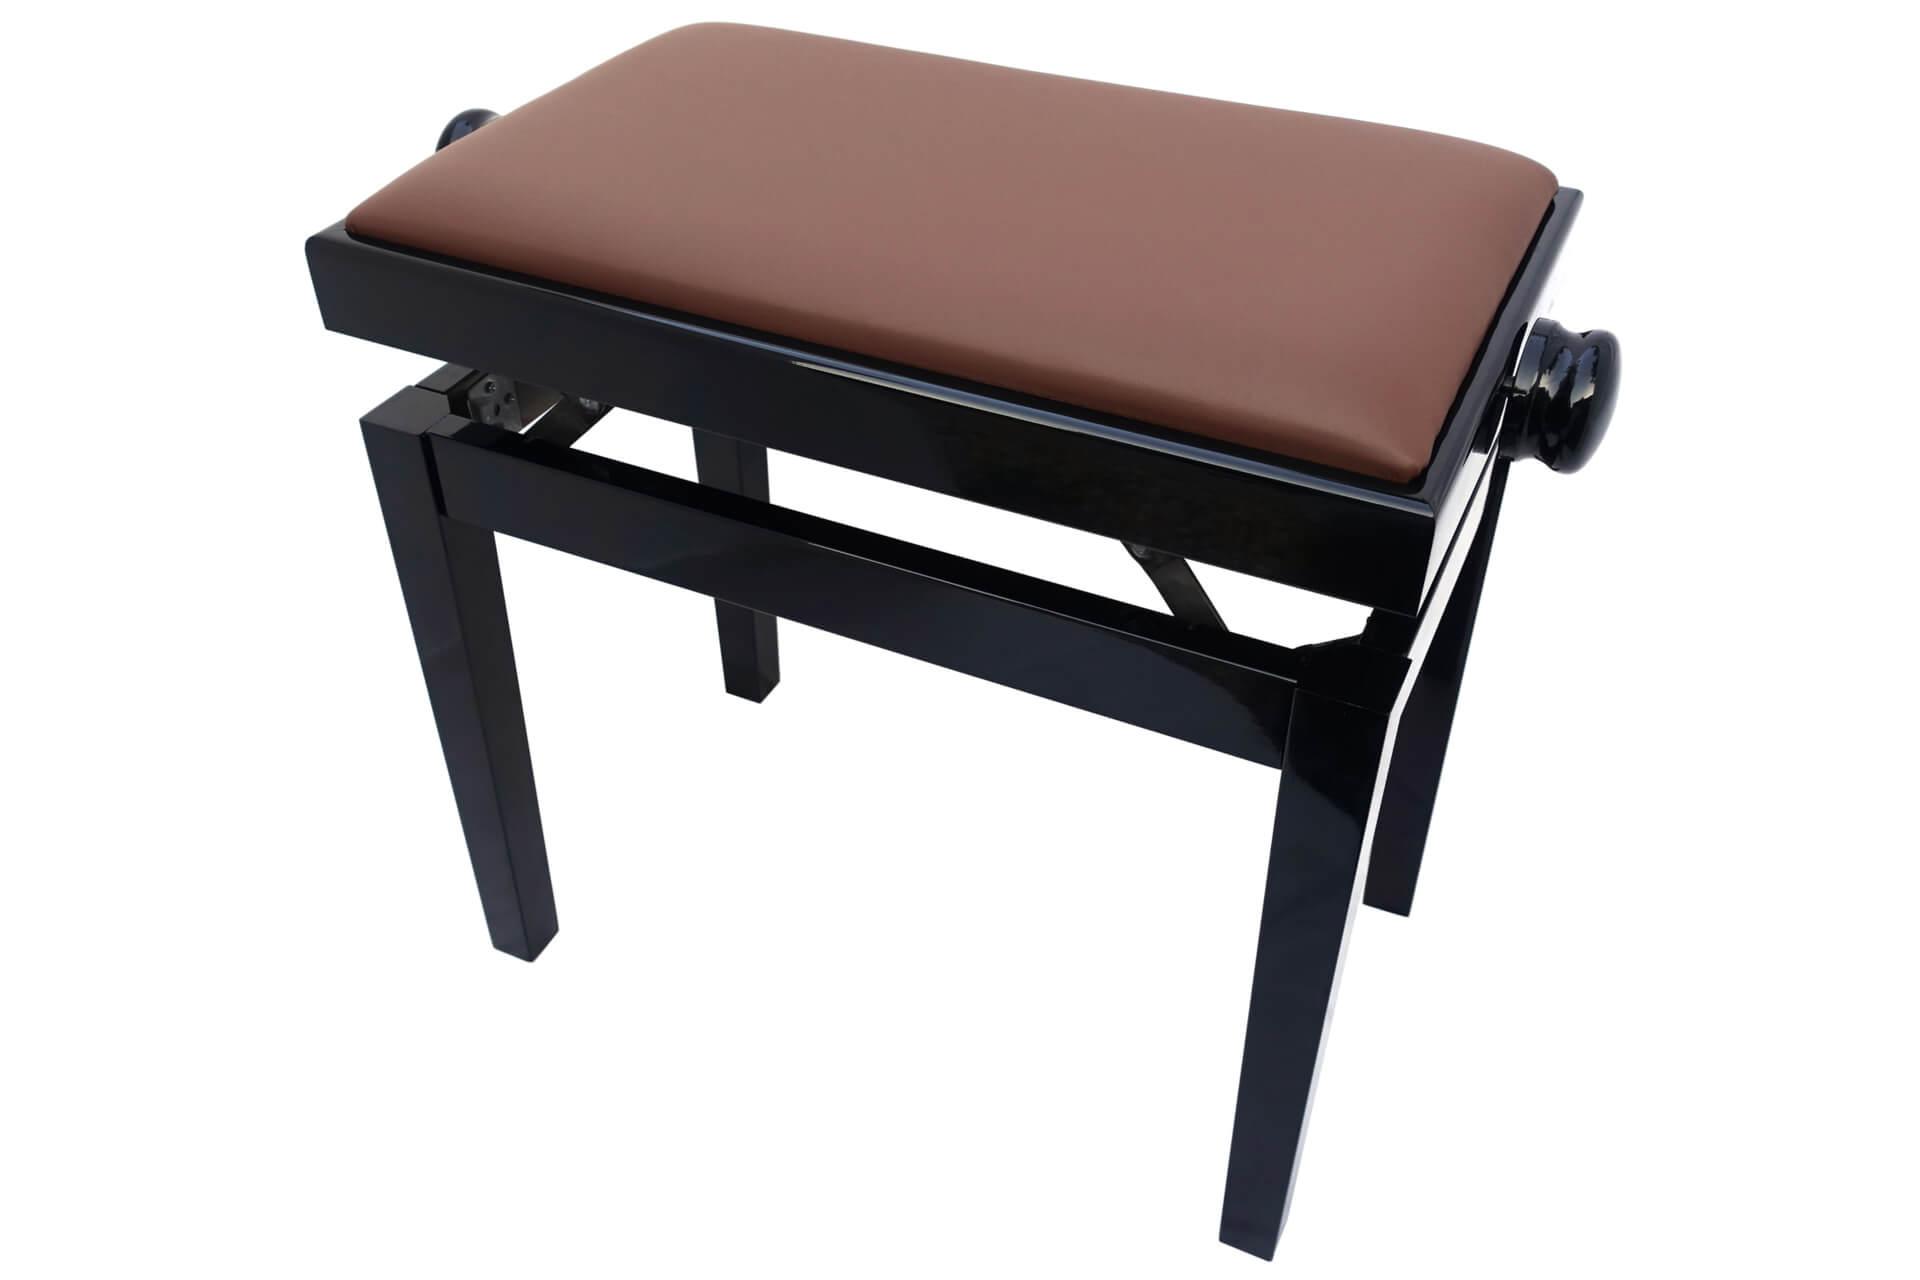 tabouret de piano rossini veritable cuir marron. Black Bedroom Furniture Sets. Home Design Ideas